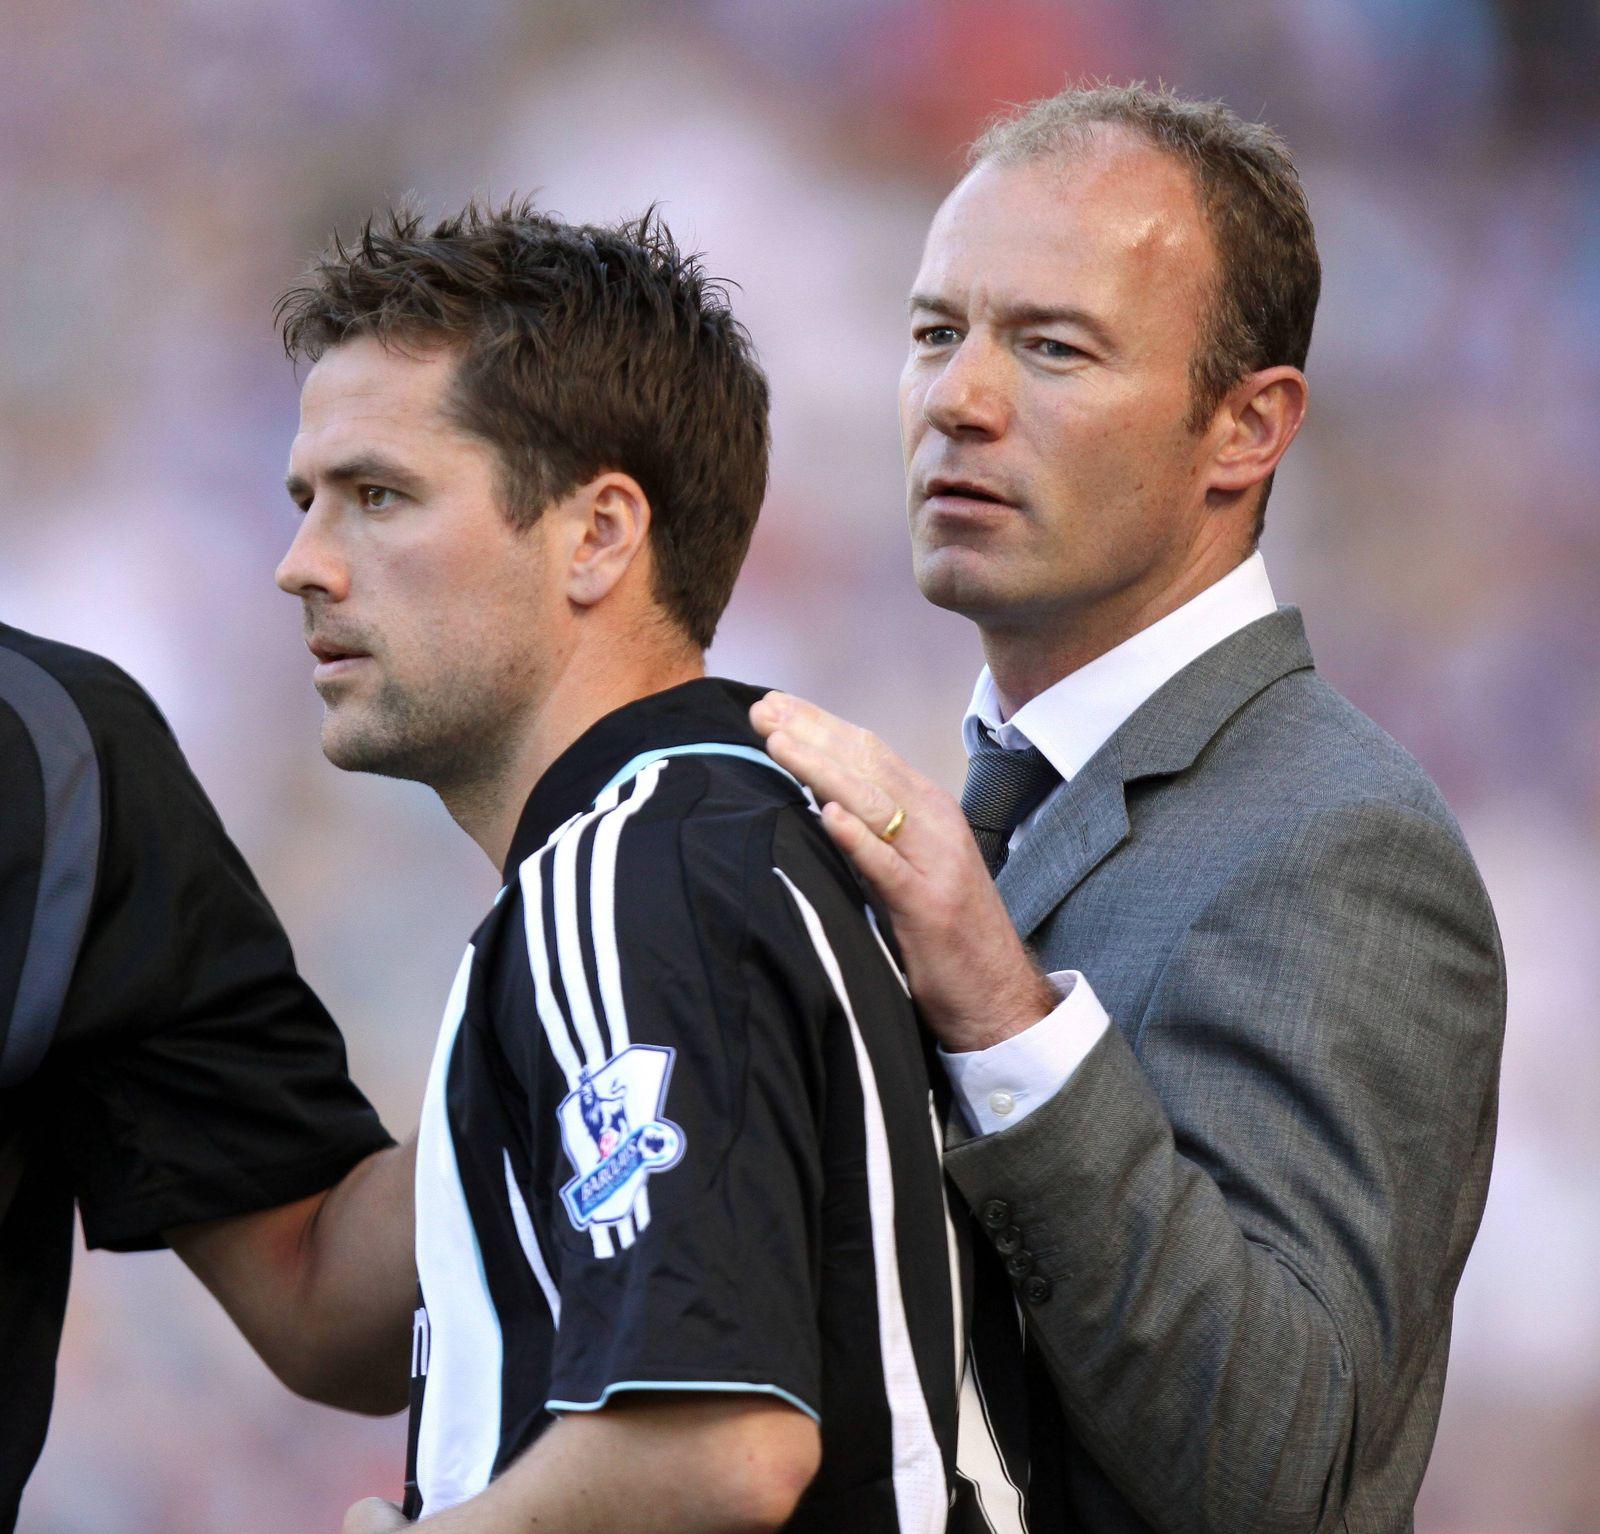 EINMALIGE VERWENDUNG Michael Owen/ Alan Shearer/ Newcastle